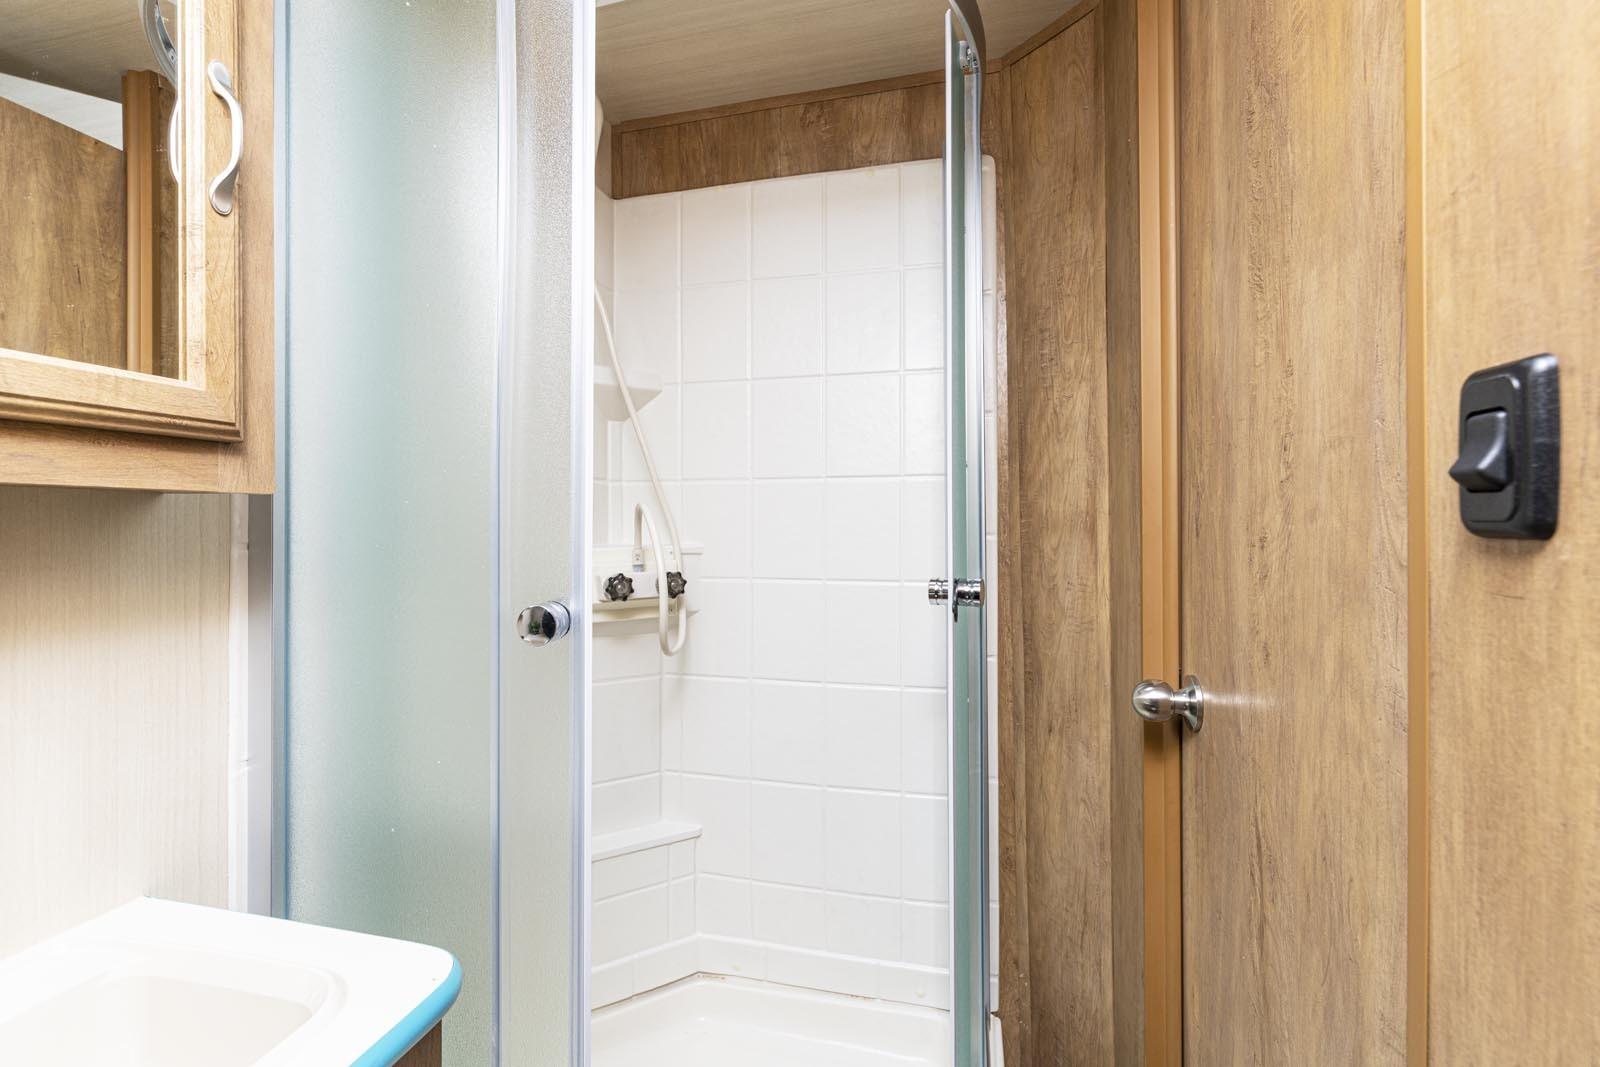 21 19csk turq shower